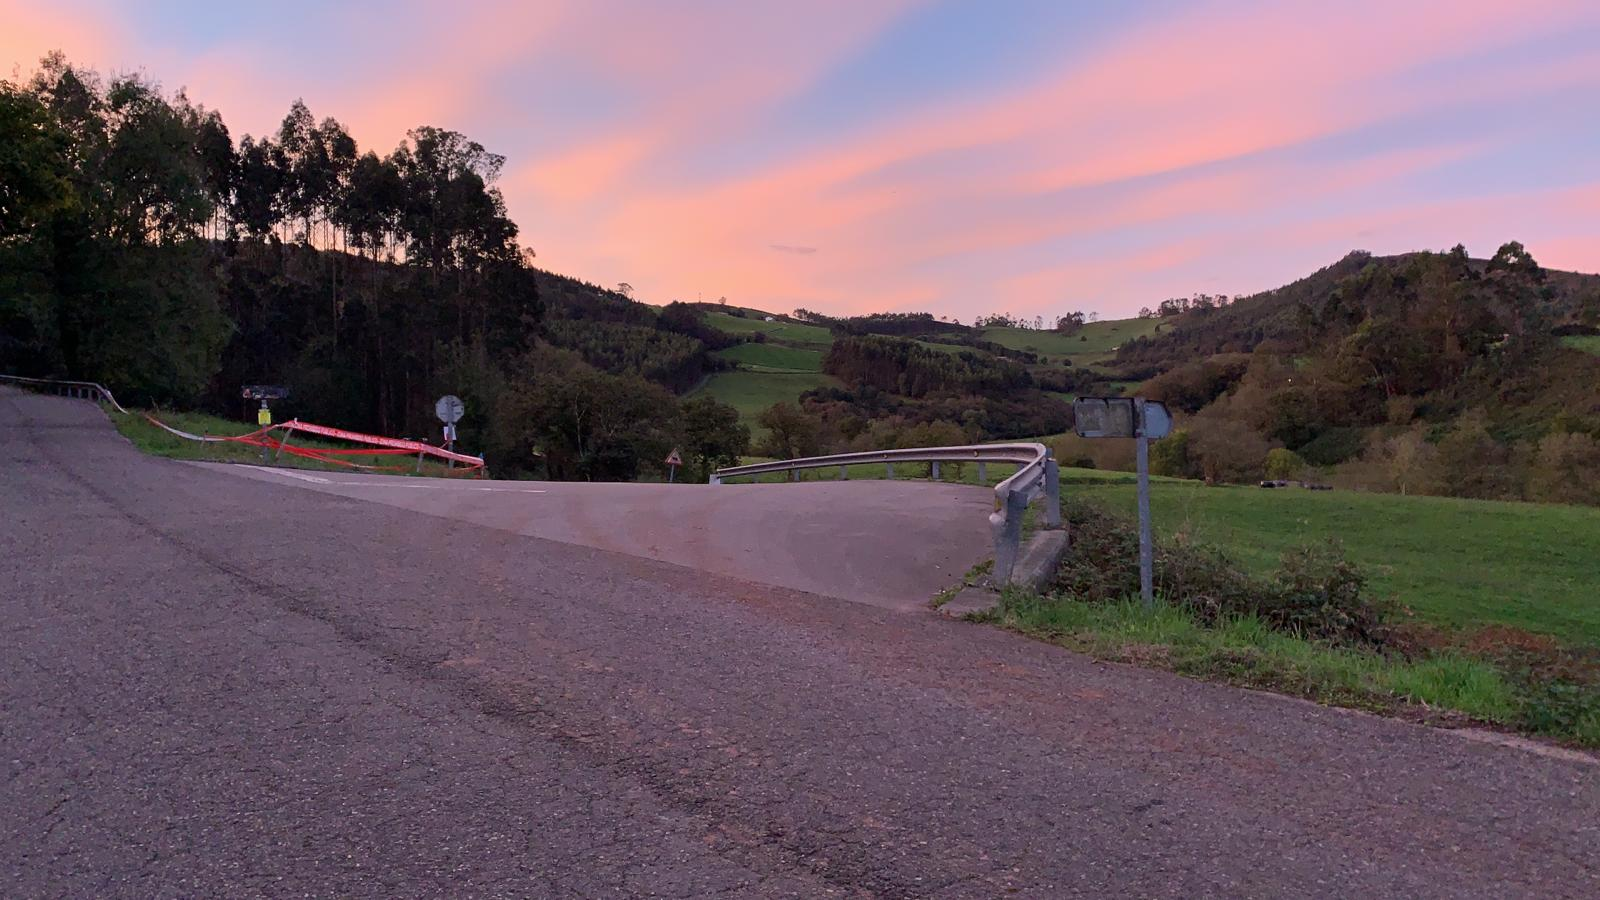 CERA + ERT: 57º Rallye Princesa de Asturias - Ciudad de Oviedo [23-24 Octubre] - Página 2 20201024085009